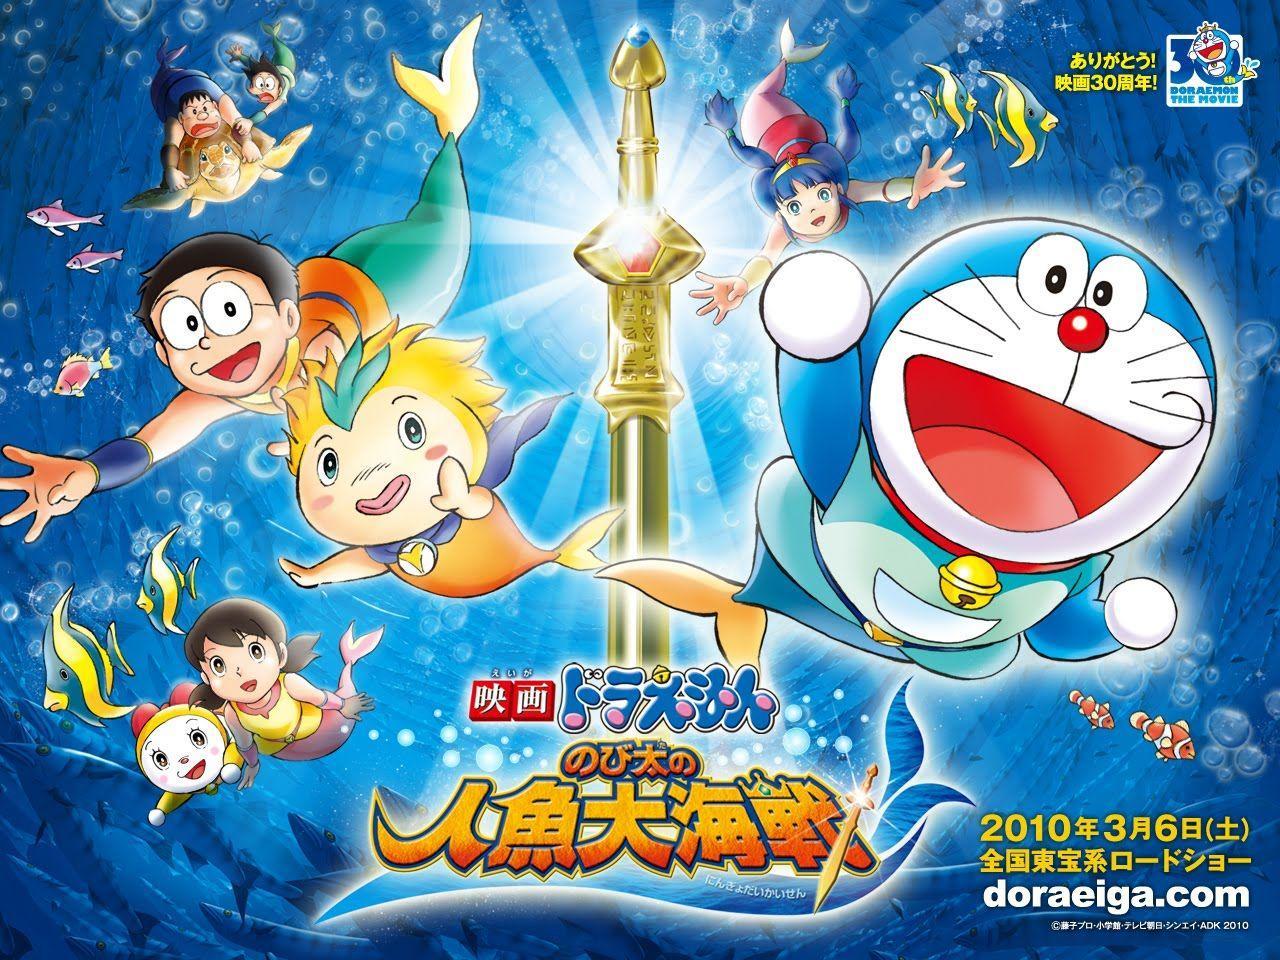 Doraemon Ki Nayi Movie Wallpaper